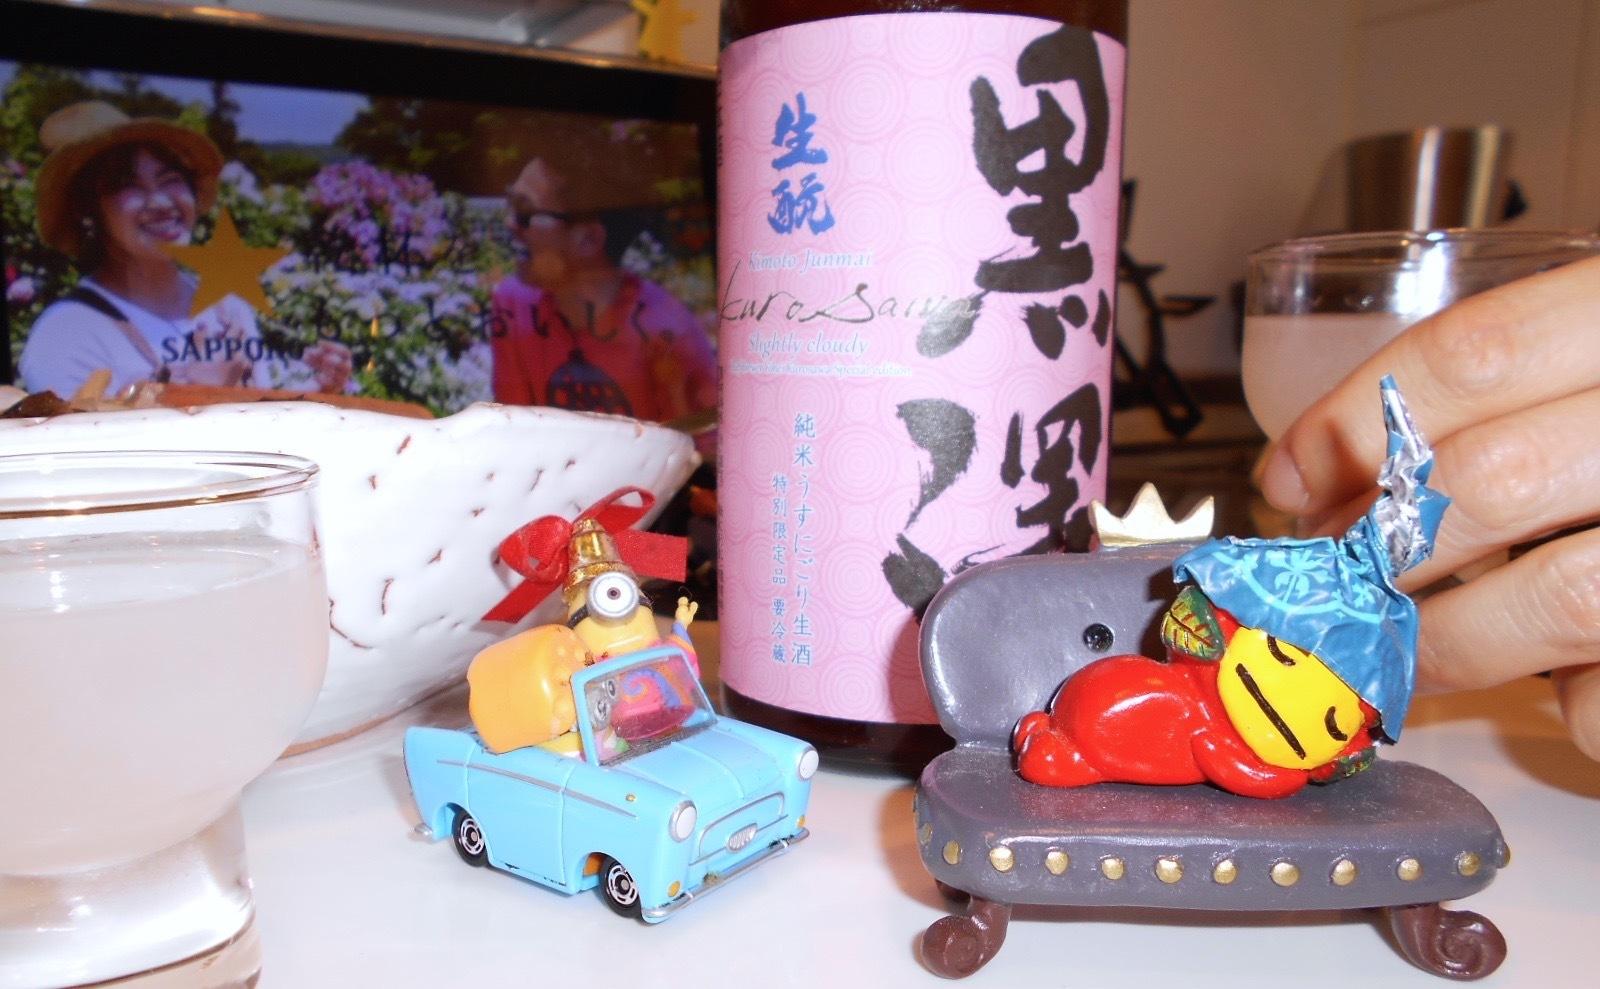 kurosawa_usunigori30by4.jpg